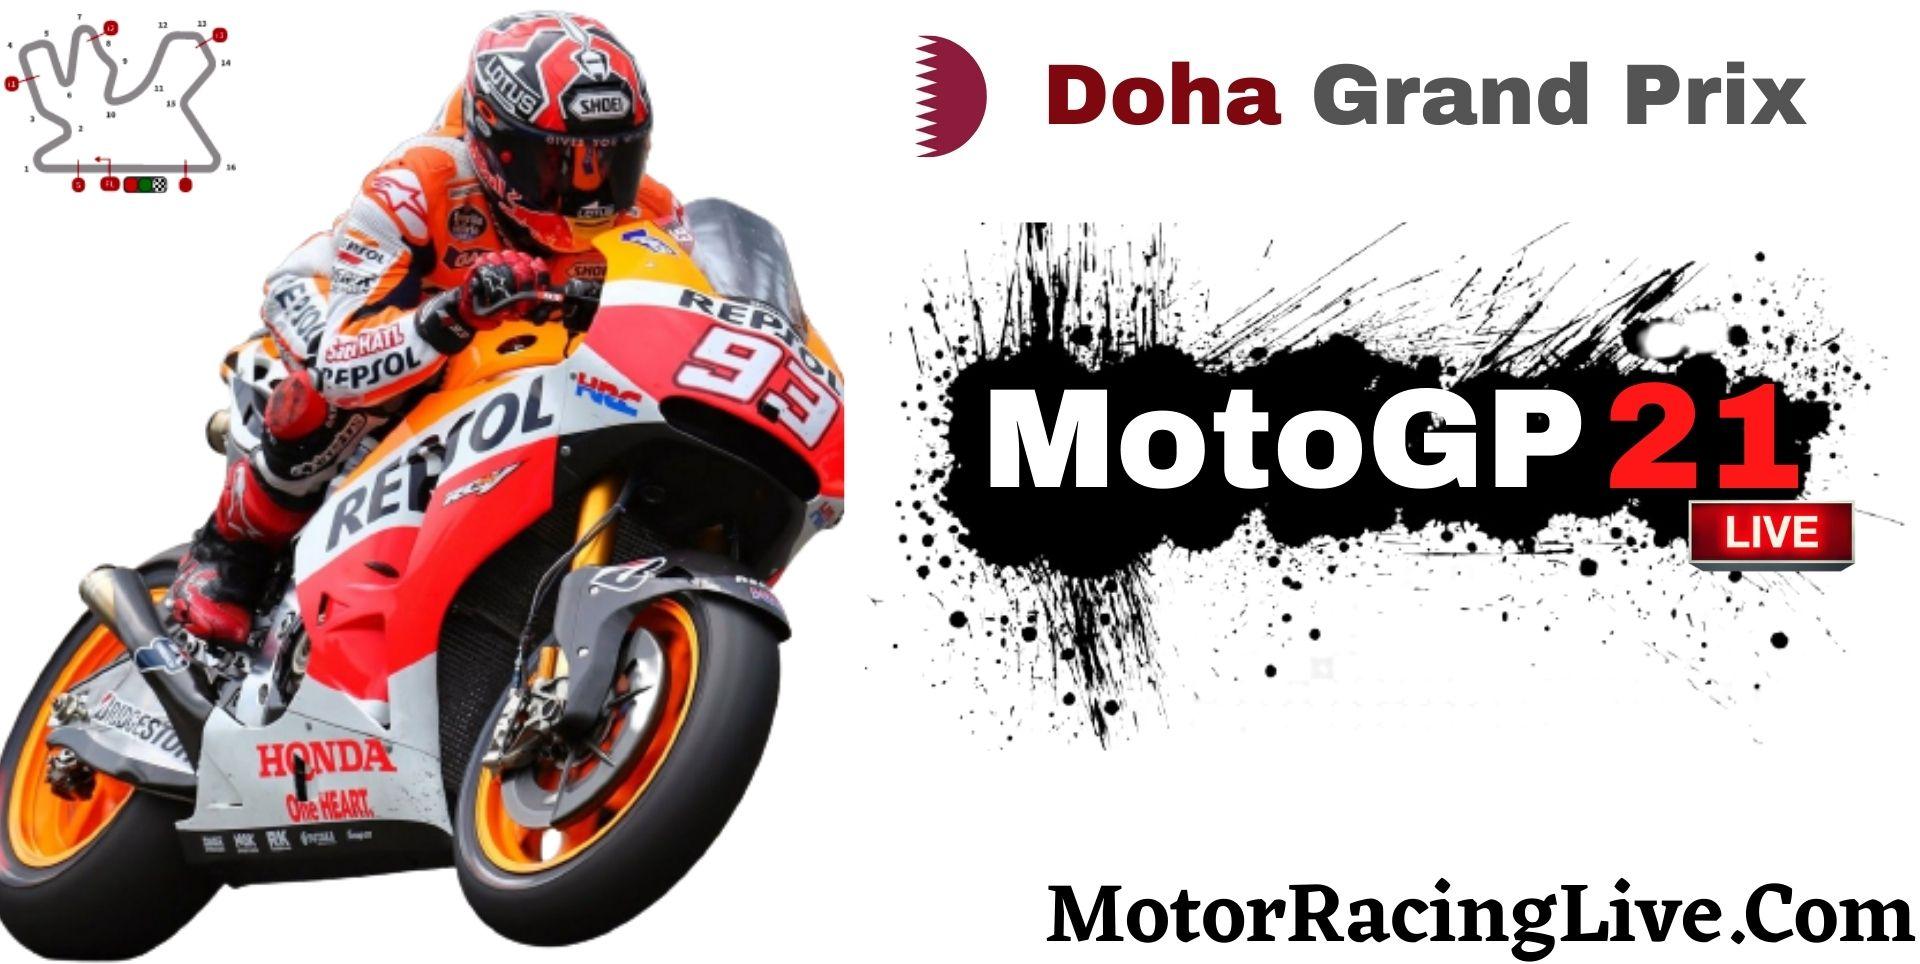 Doha Grand Prix MotoGP 2021 Live Stream | Full Race Replay